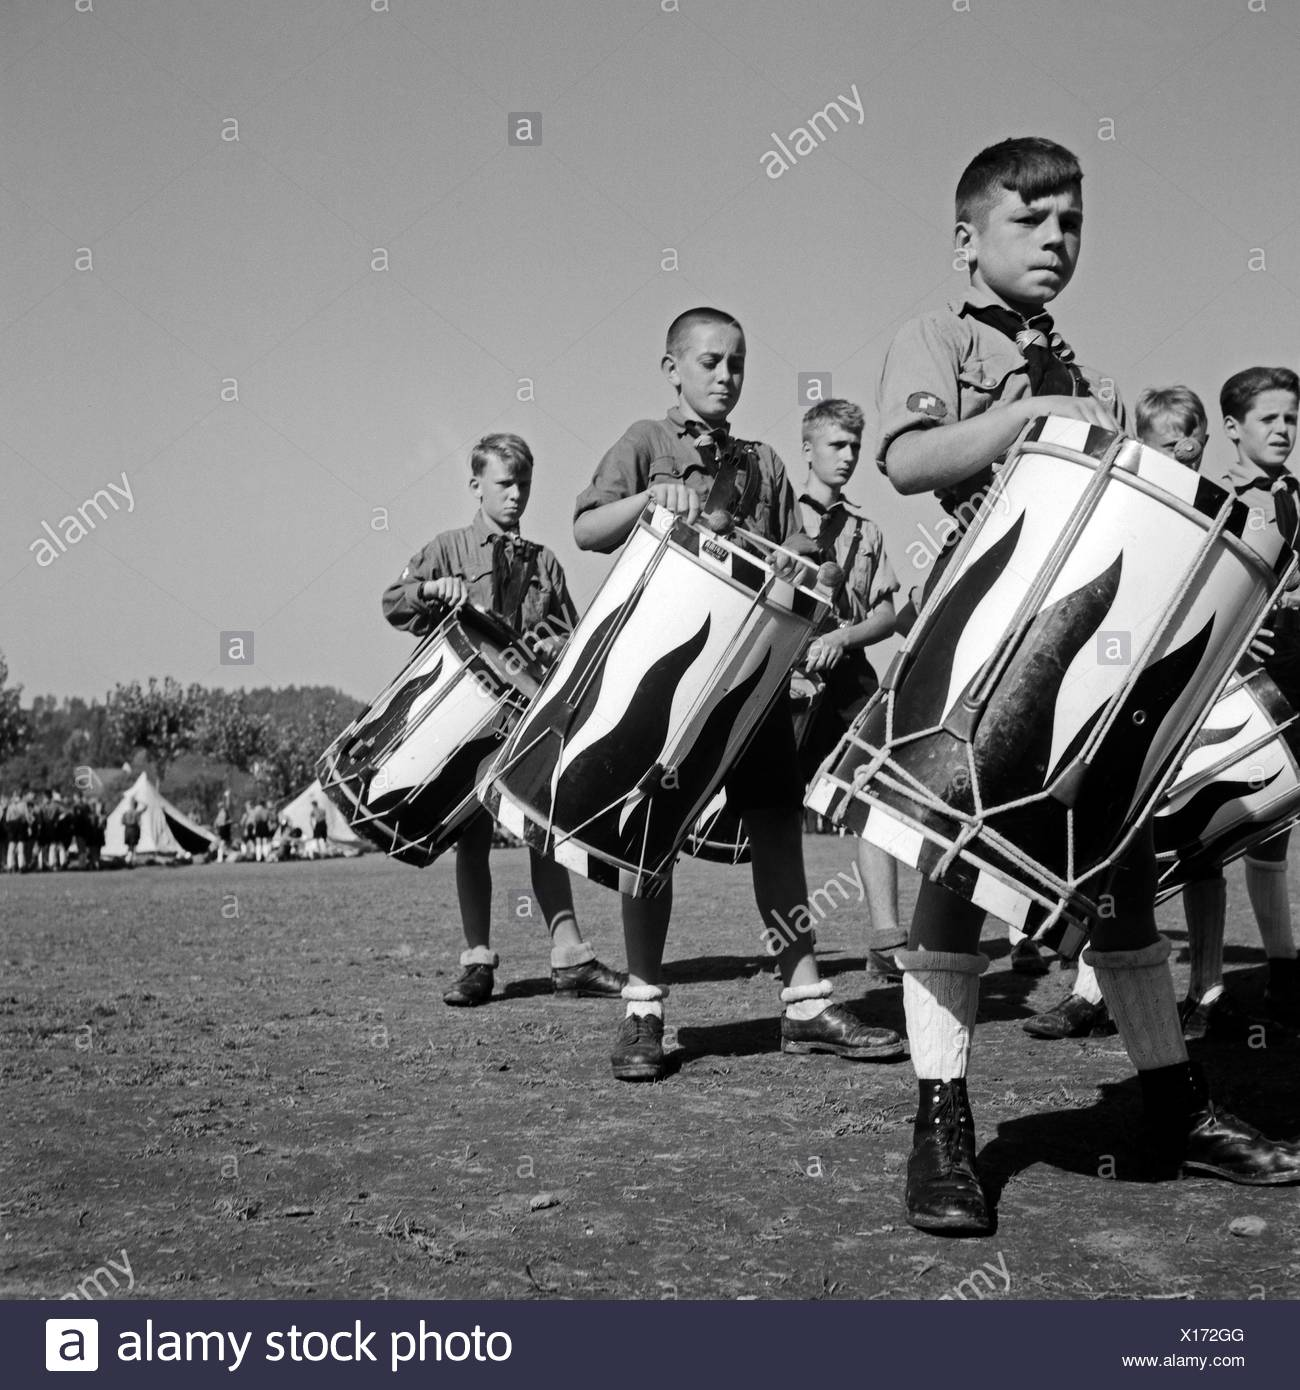 Jungen des Tromnmlercorps des Jungvolk Musikzuges geben den Takt im Hitlerjugend Lager, Österreich 1930er Jahre. Drummer boys of the Jungvolk beating their drums mustering at the Hitler youth camp, Austria 1930s. - Stock Image